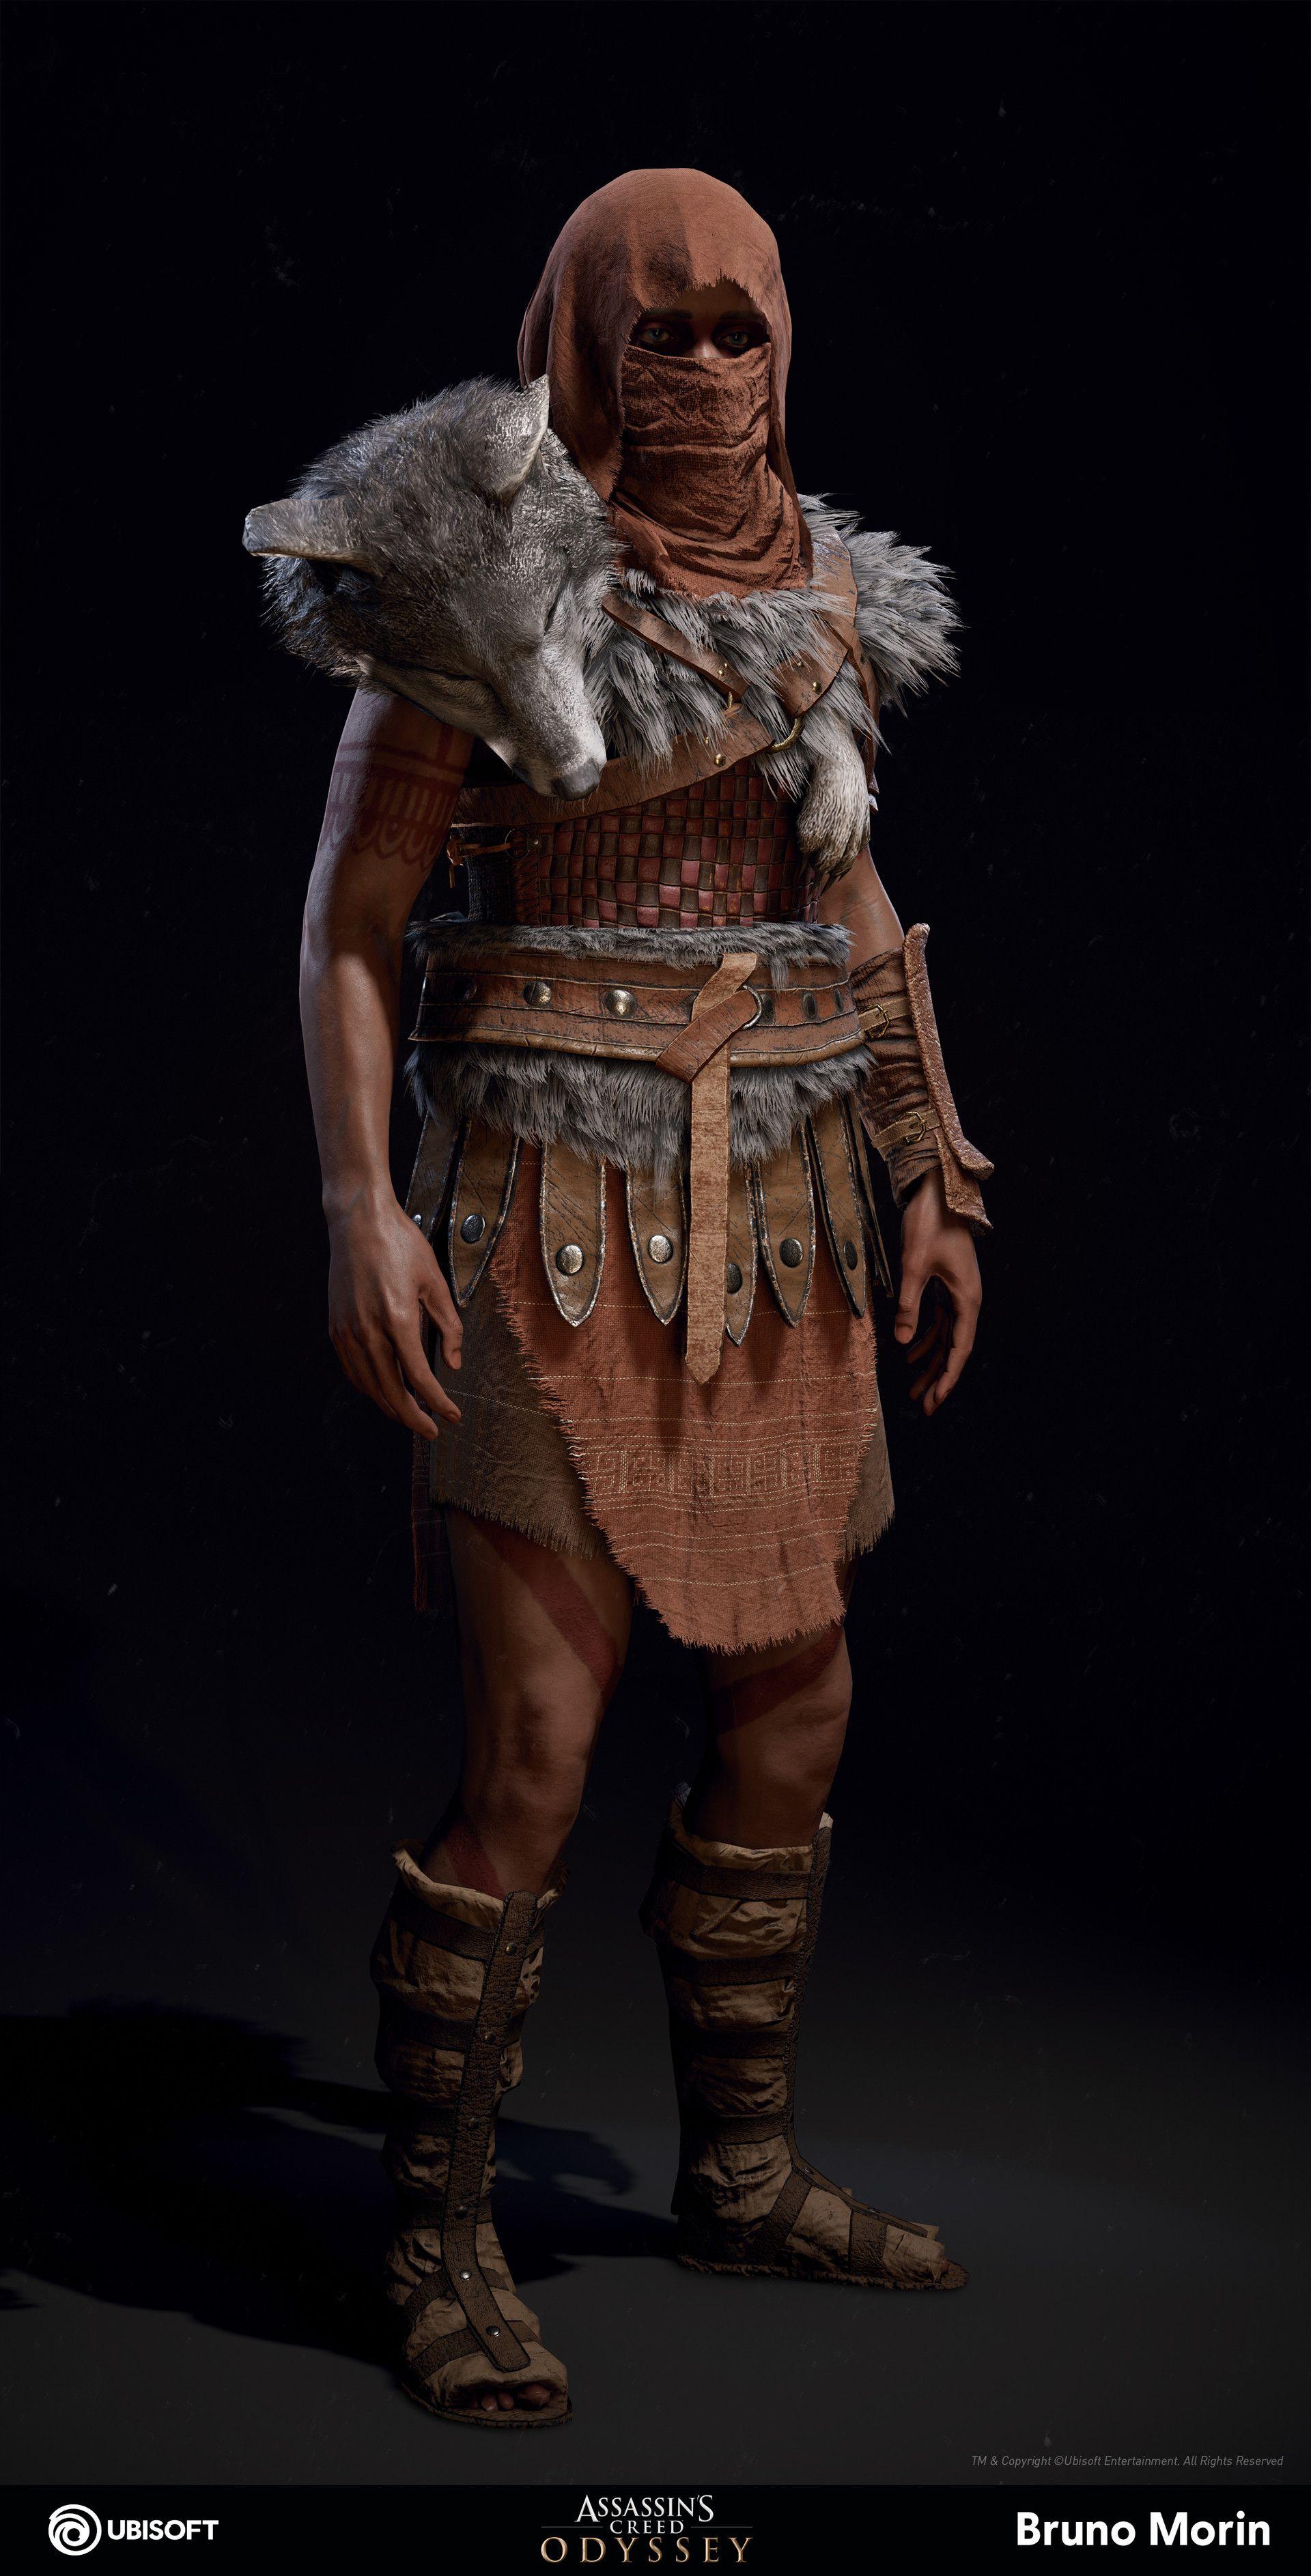 Artstation Assassin S Creed Odyssey Daughters Of Artemis Amazon Bruno Morin Assassins Creed Artwork Assassins Creed Art Assassins Creed Odyssey